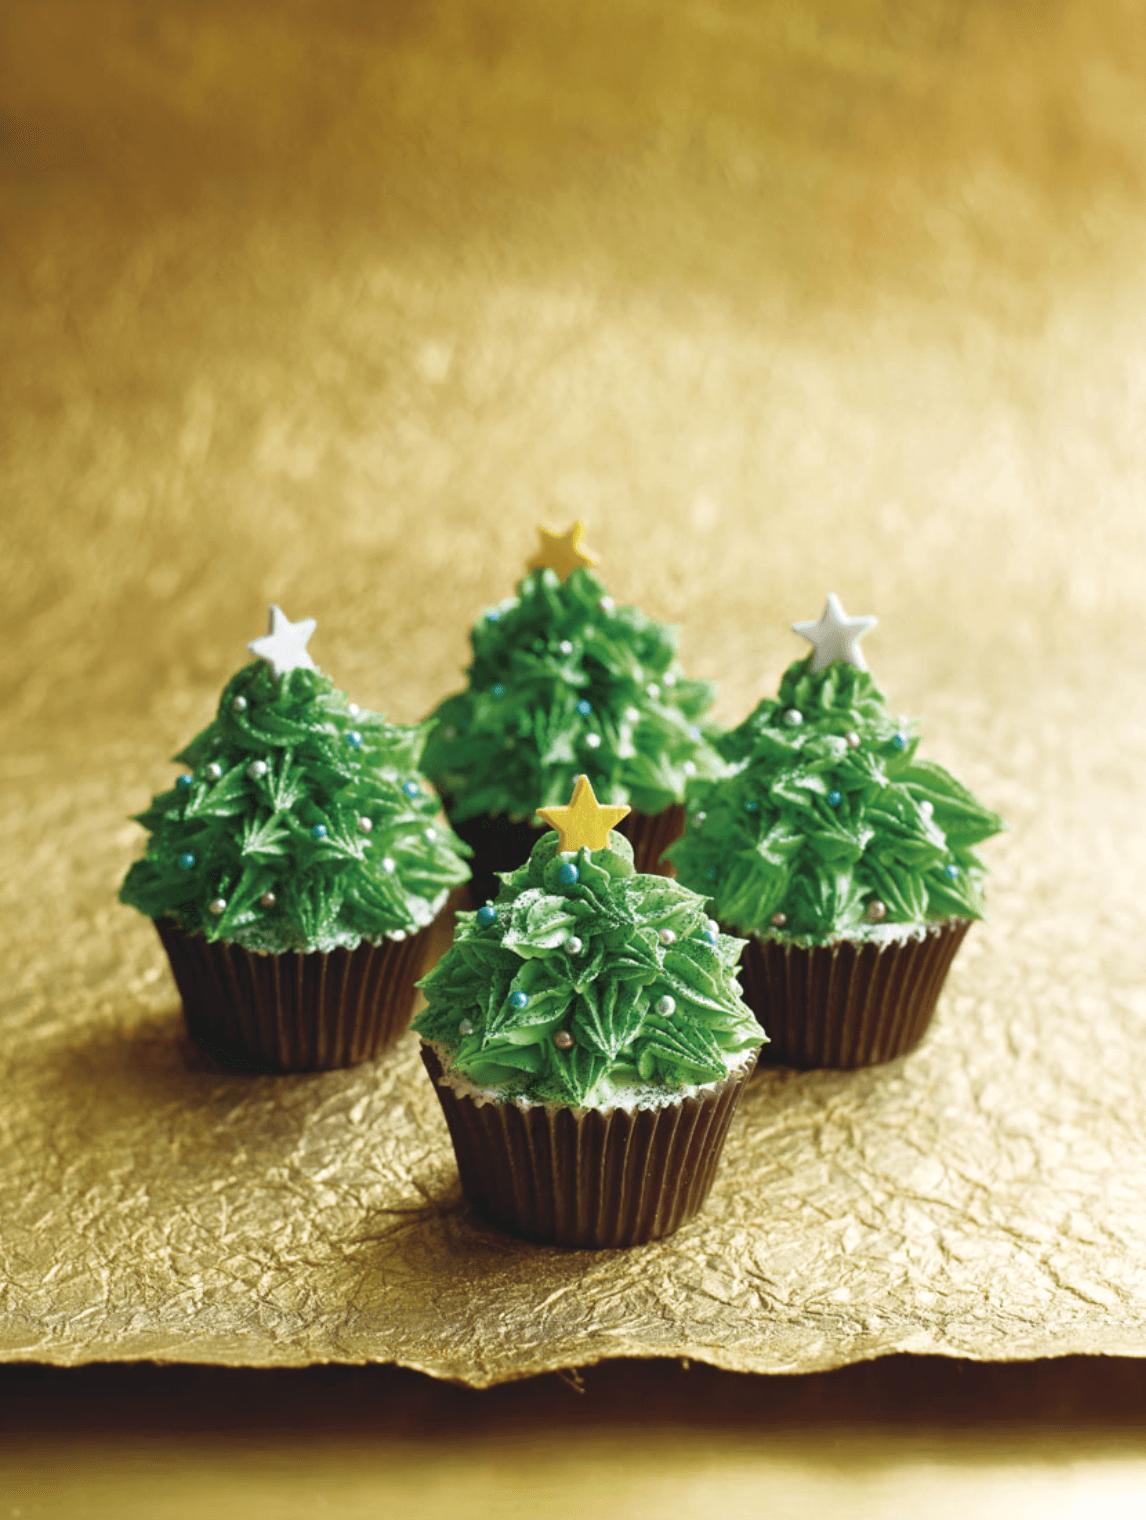 Cute Christmas Trees Cupcakes